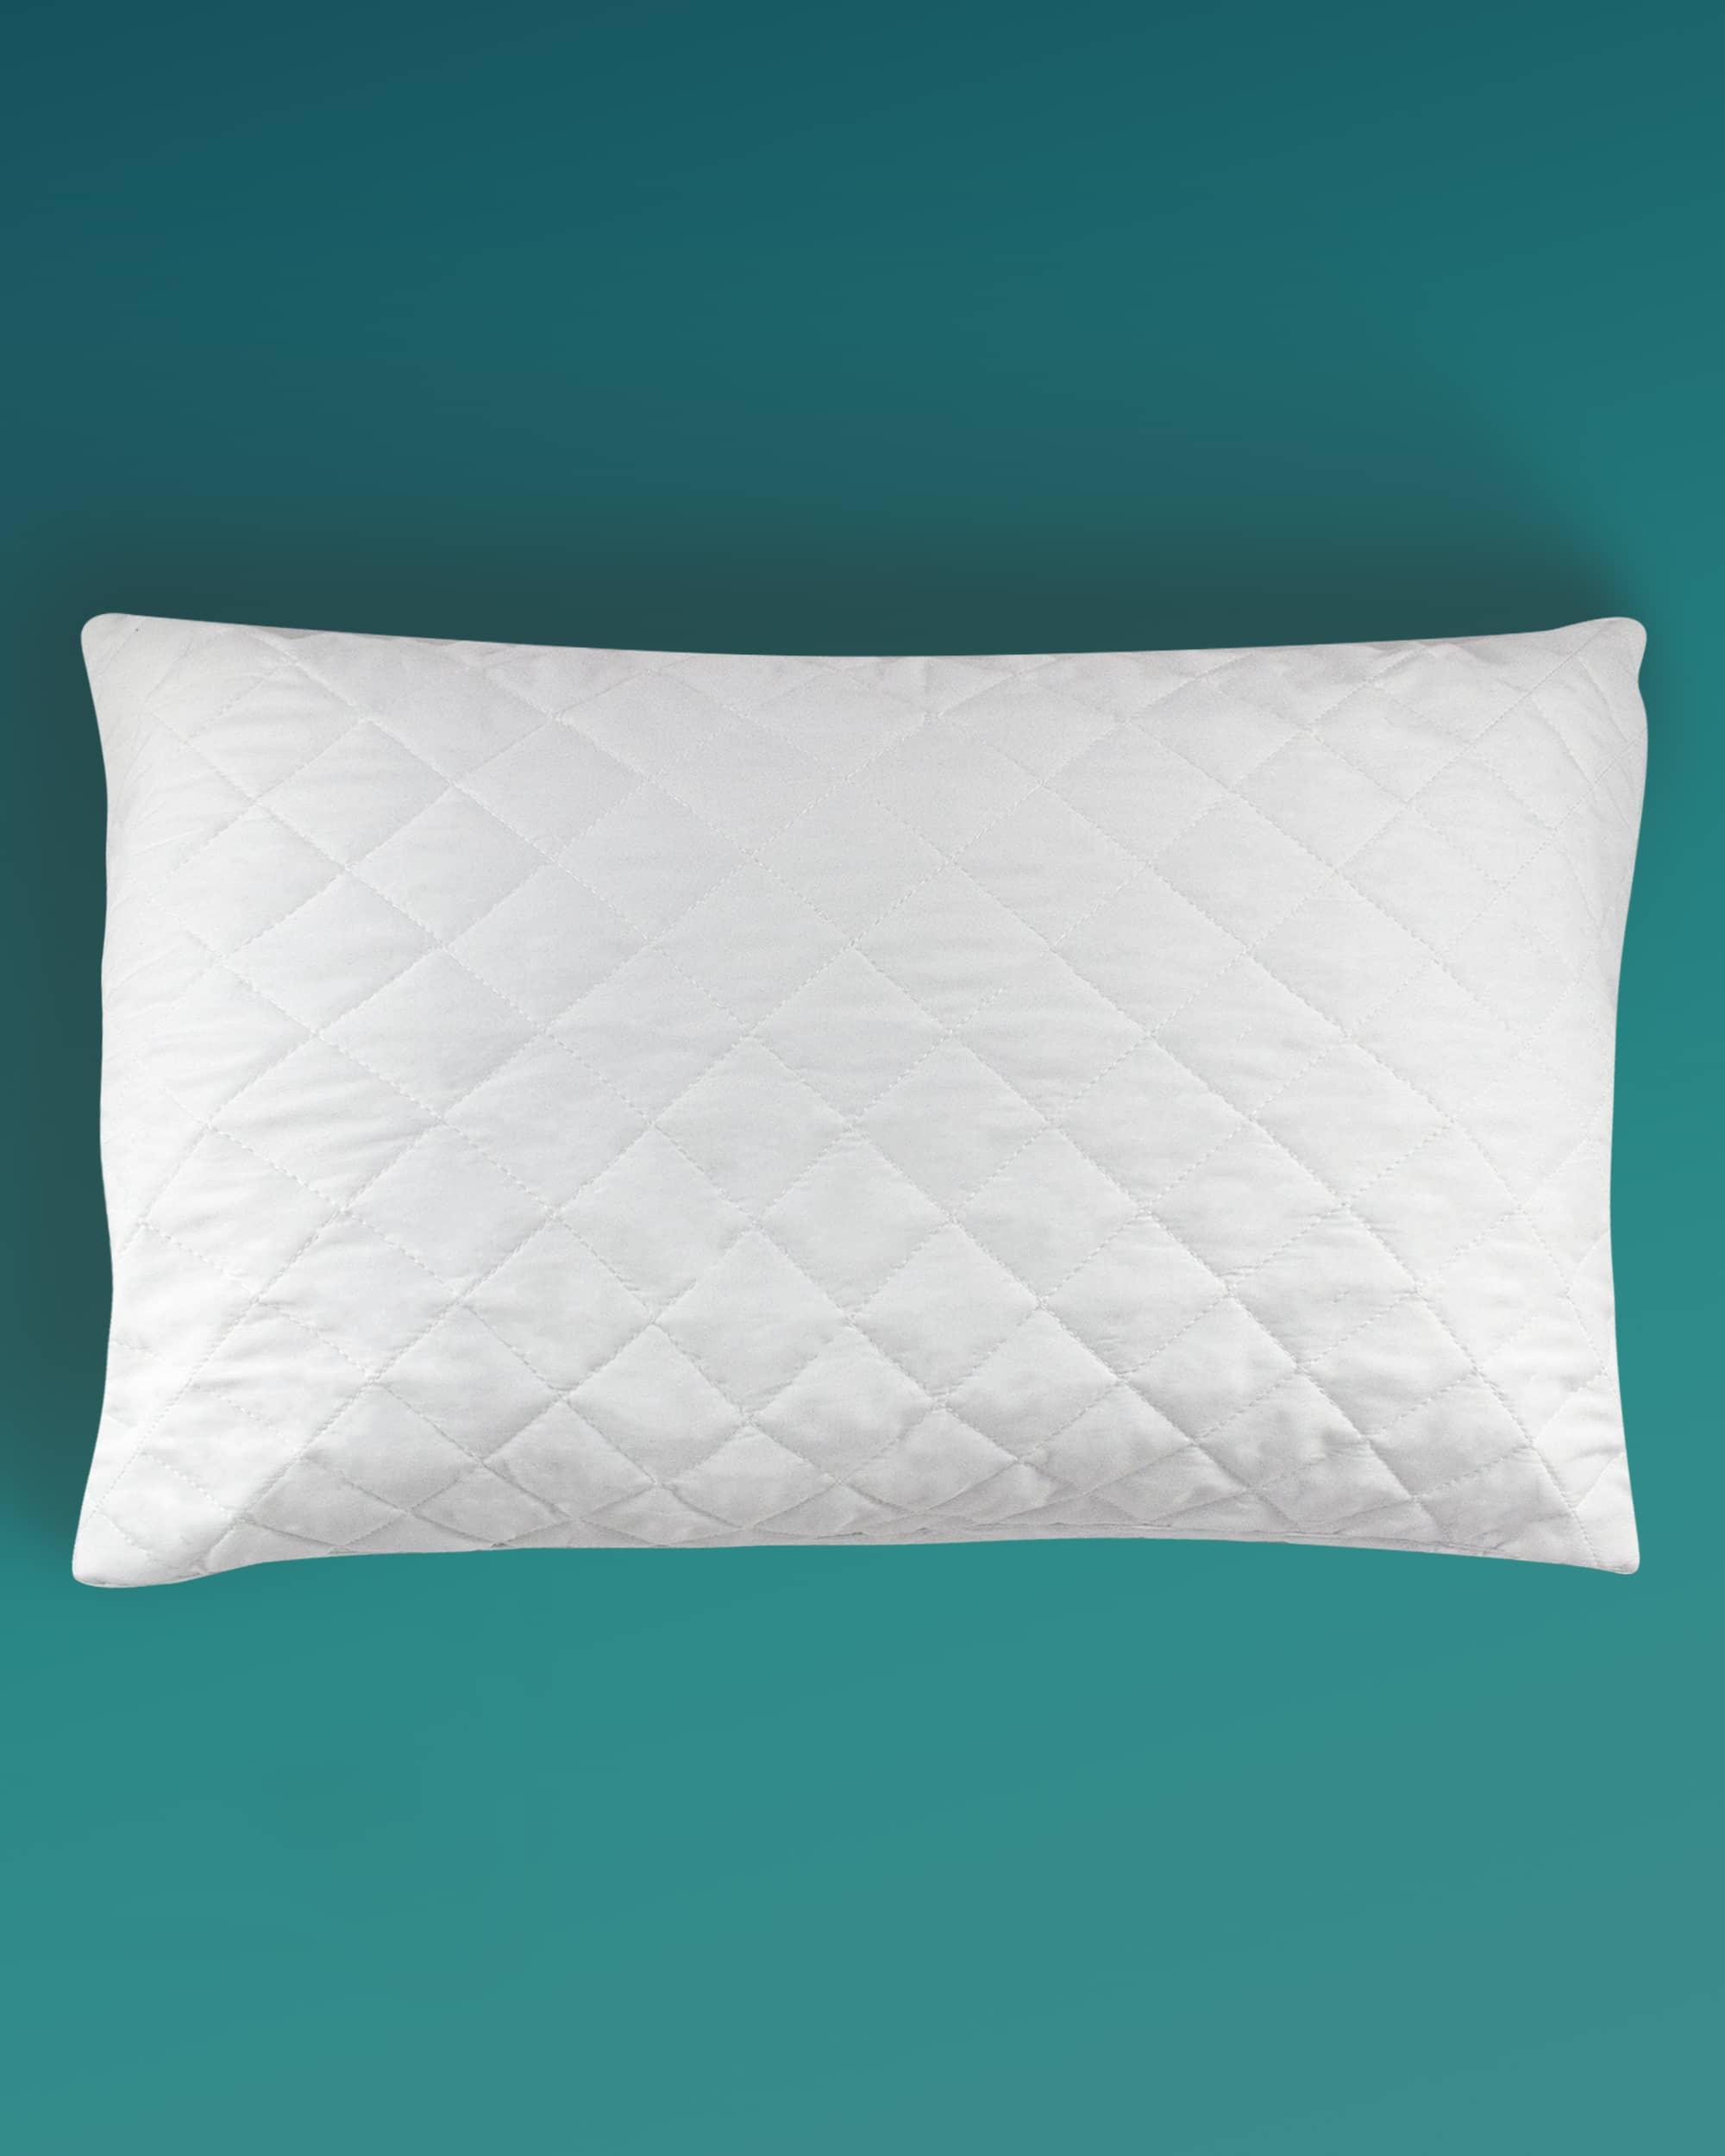 Kally Waterproof Pillow Protector